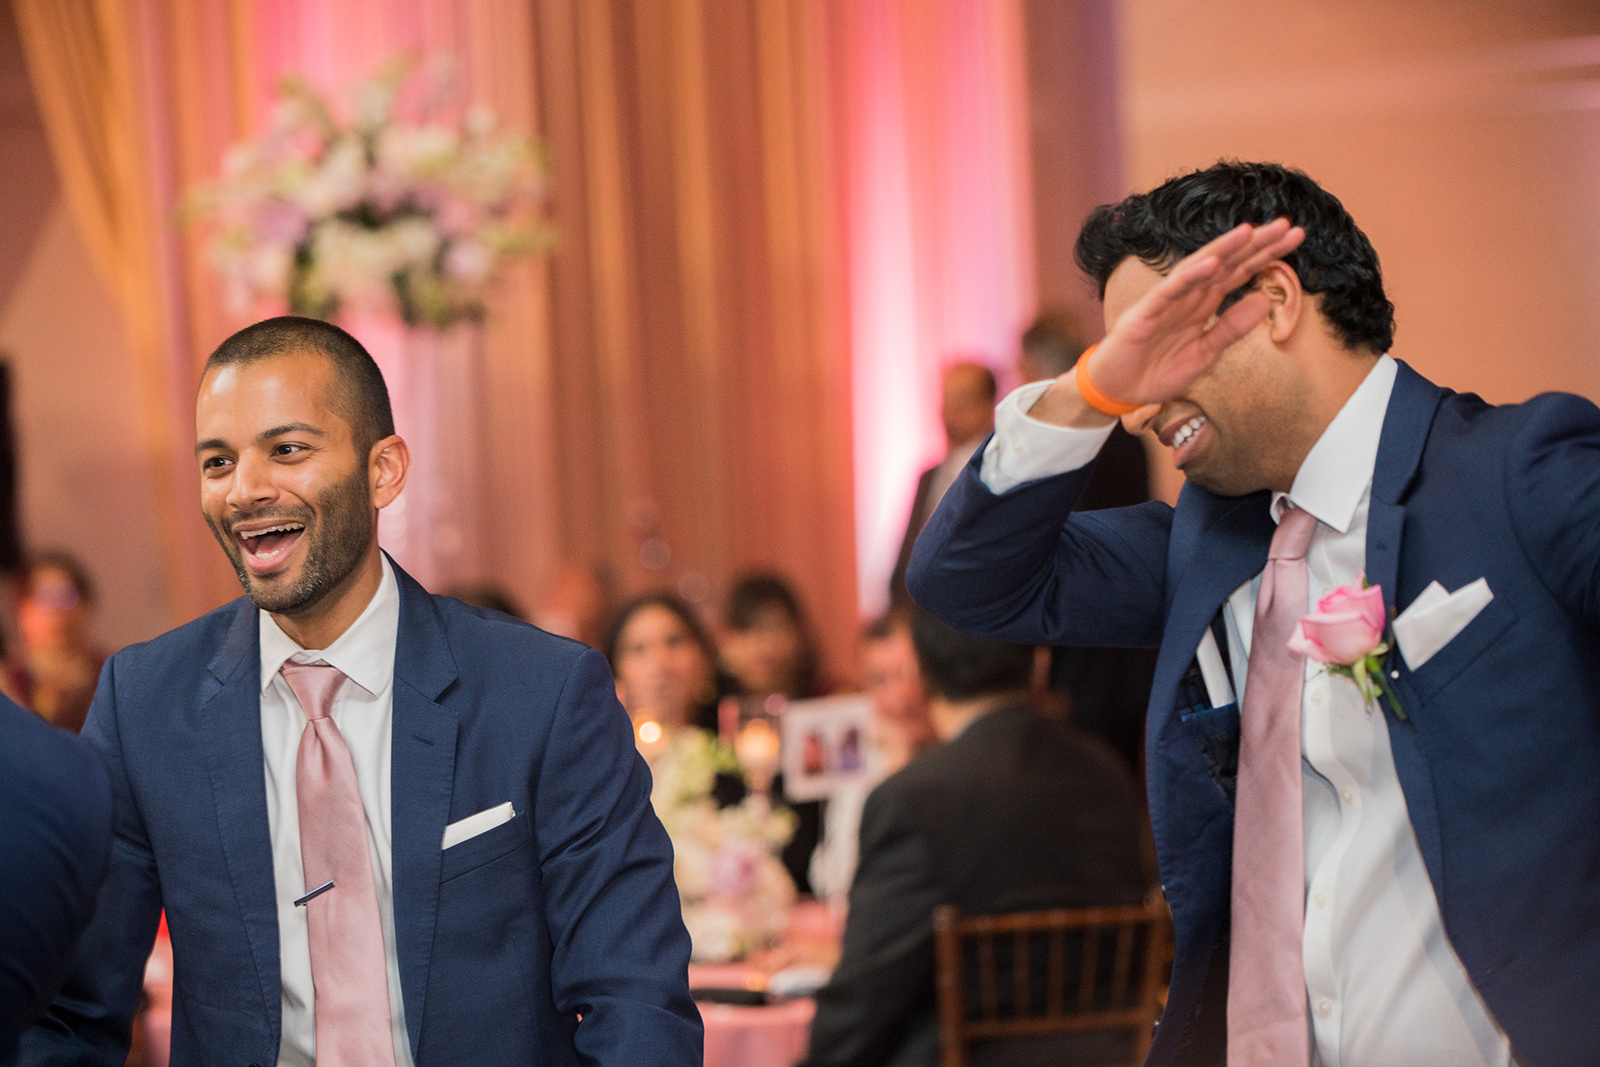 Le Cape Weddings - Sumeet and Chavi - Reception   -41.jpg